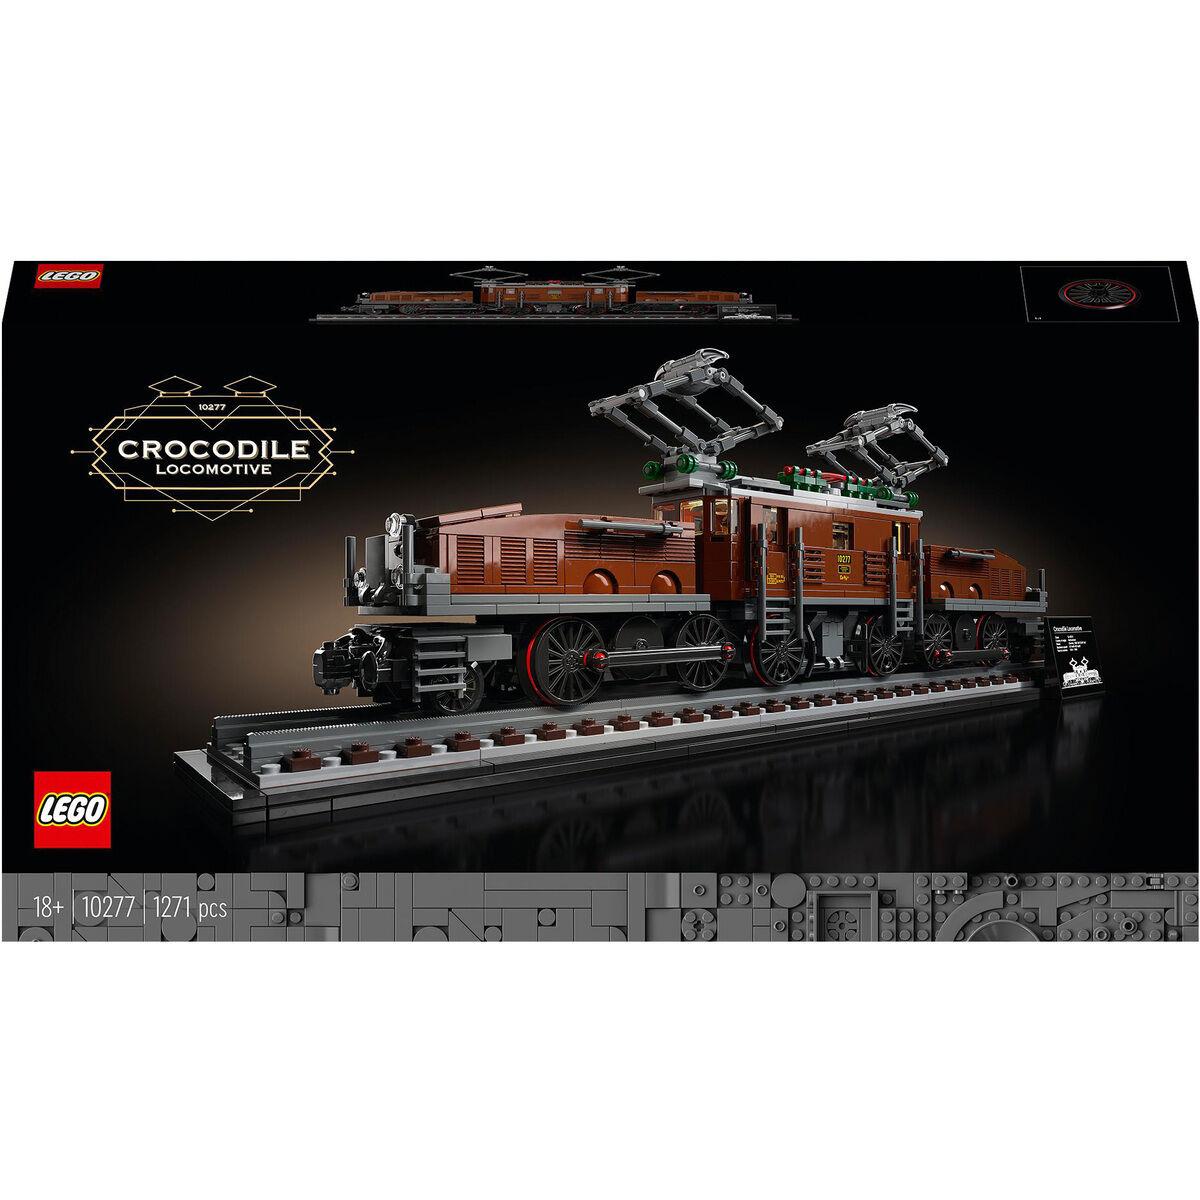 LEGO Creator Expert 10277 Lokomotive Krokodil Eisenbahn Galeria Kundenkarte Gutschein inklusive Füllartikel